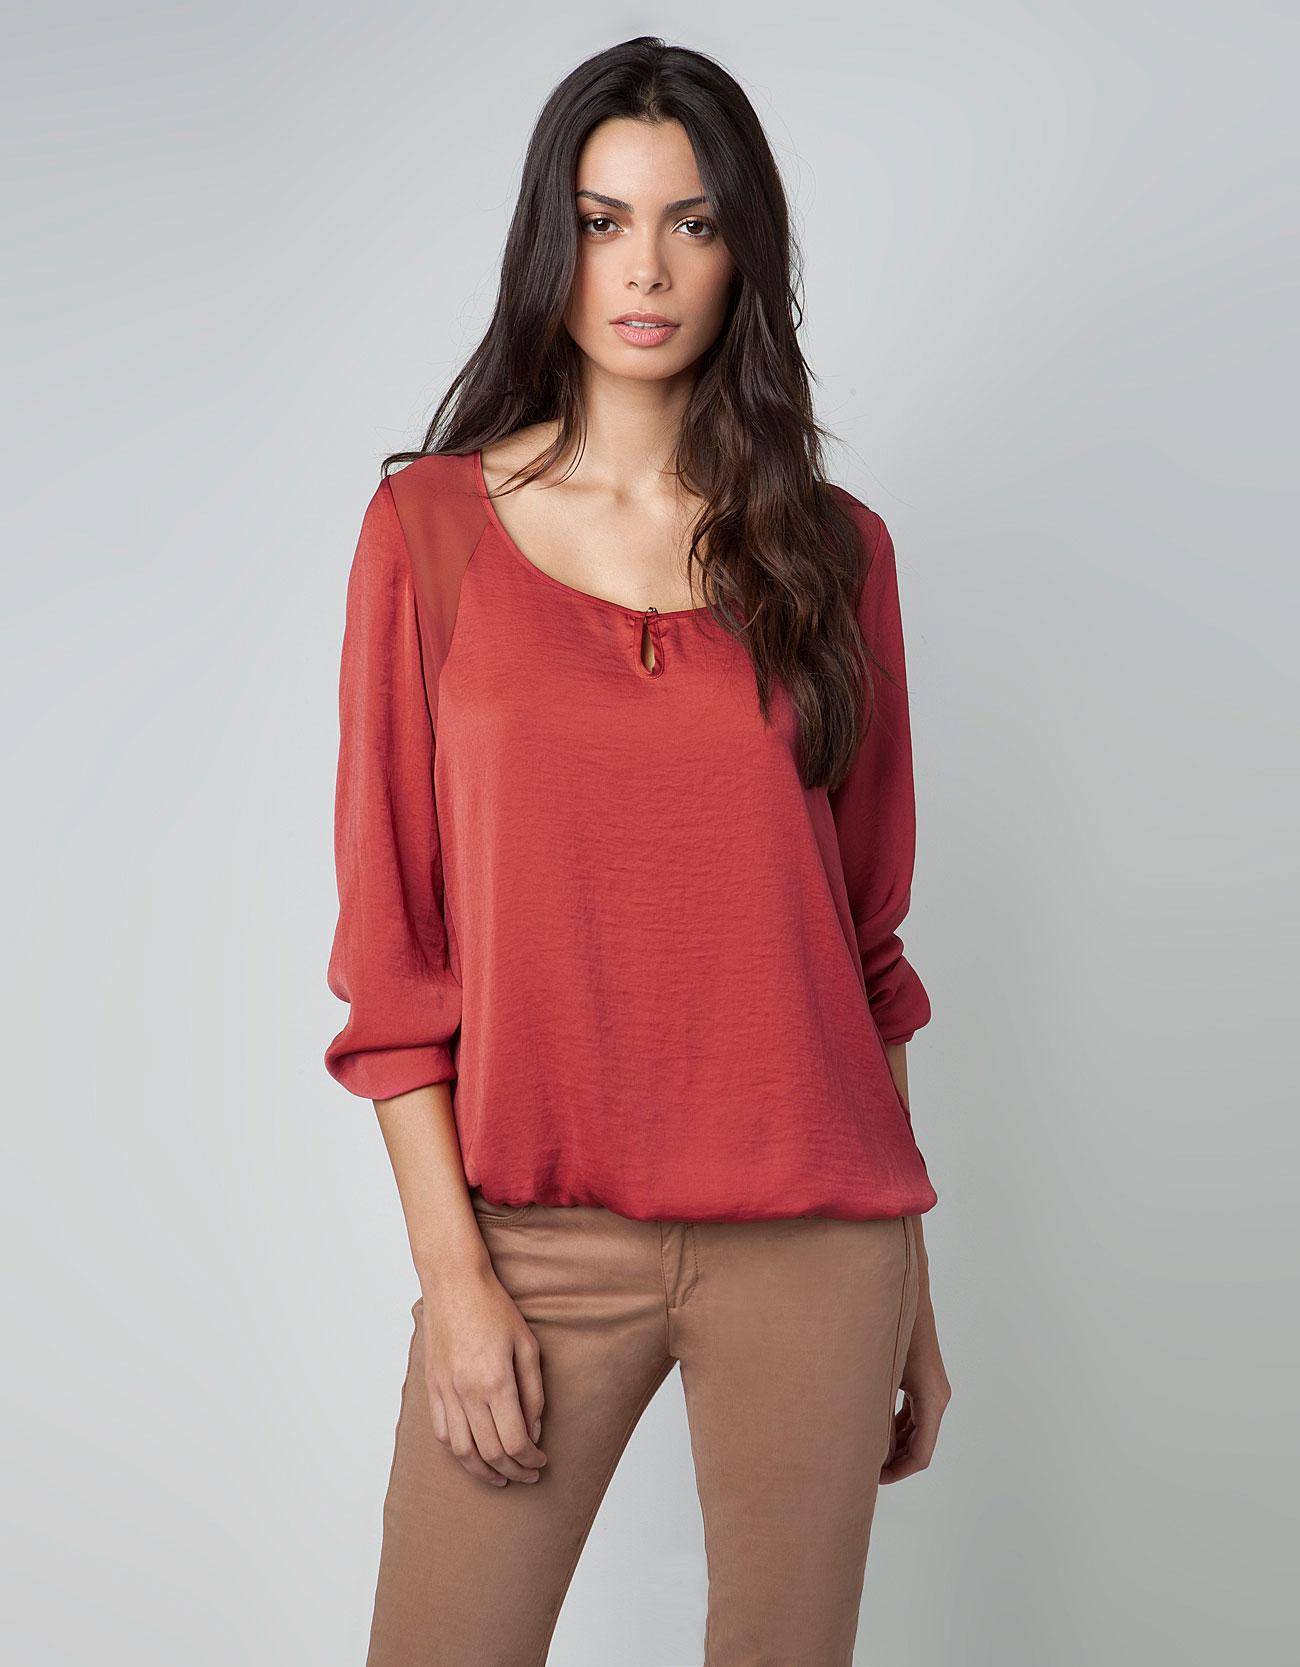 Blusas de moda en la temporada primavera verano 2013